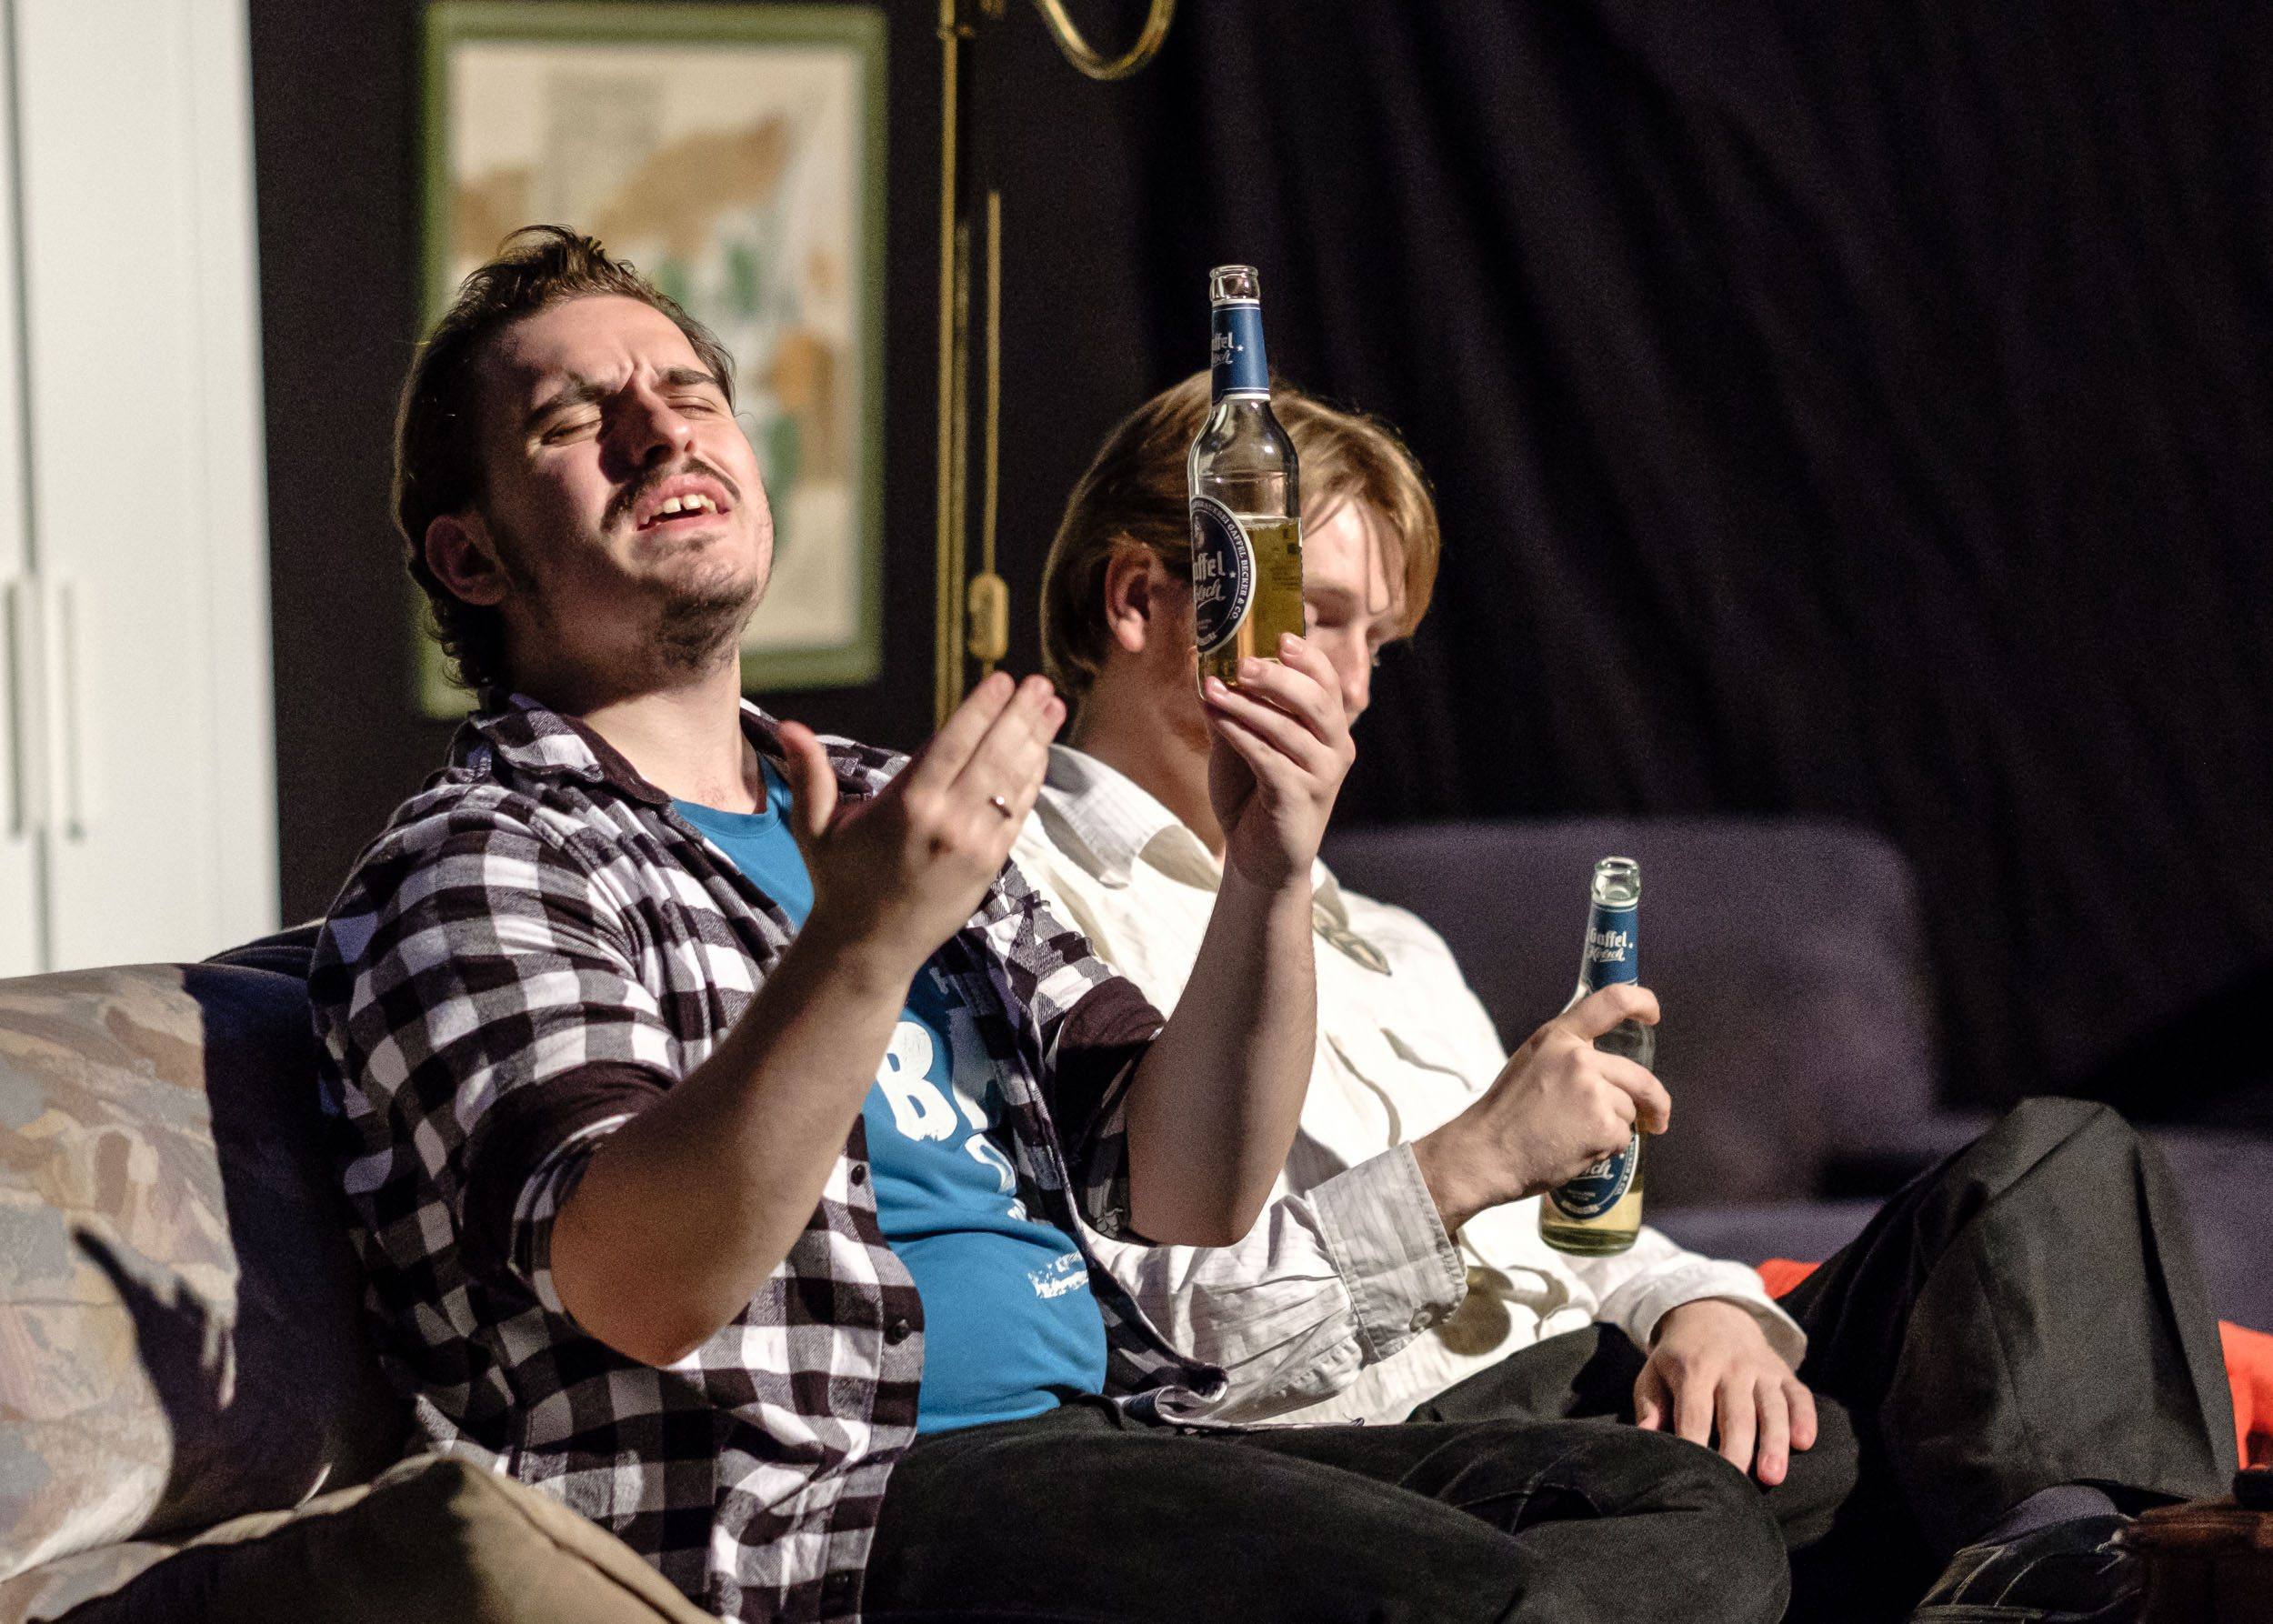 Patrick Dietrich, Oliver Krause, Buhnentheater Vlotho